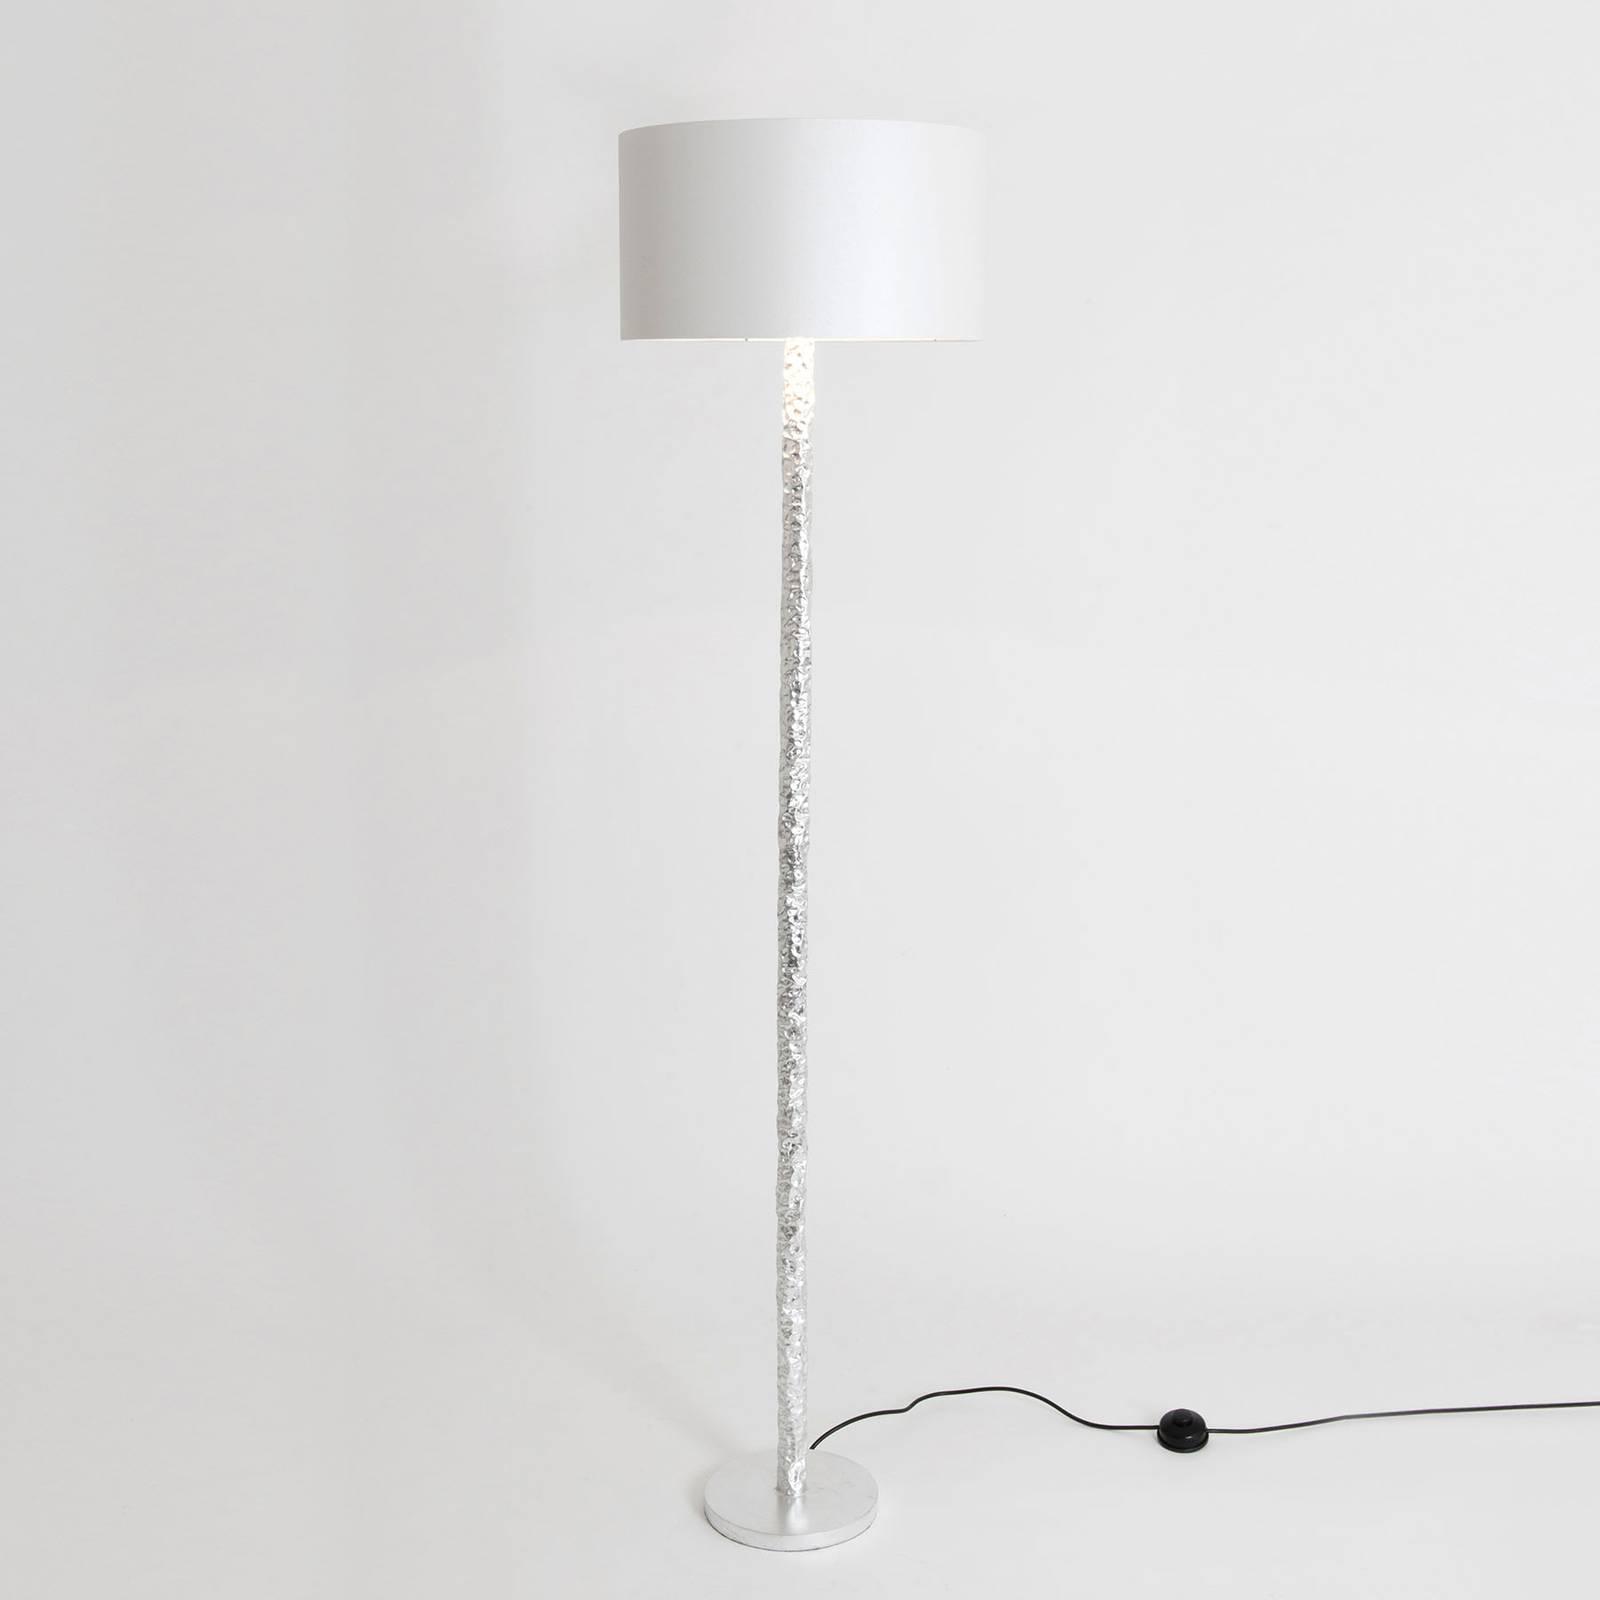 Lattiavalo Cancelliere Rotonda, valkoinen/hopea